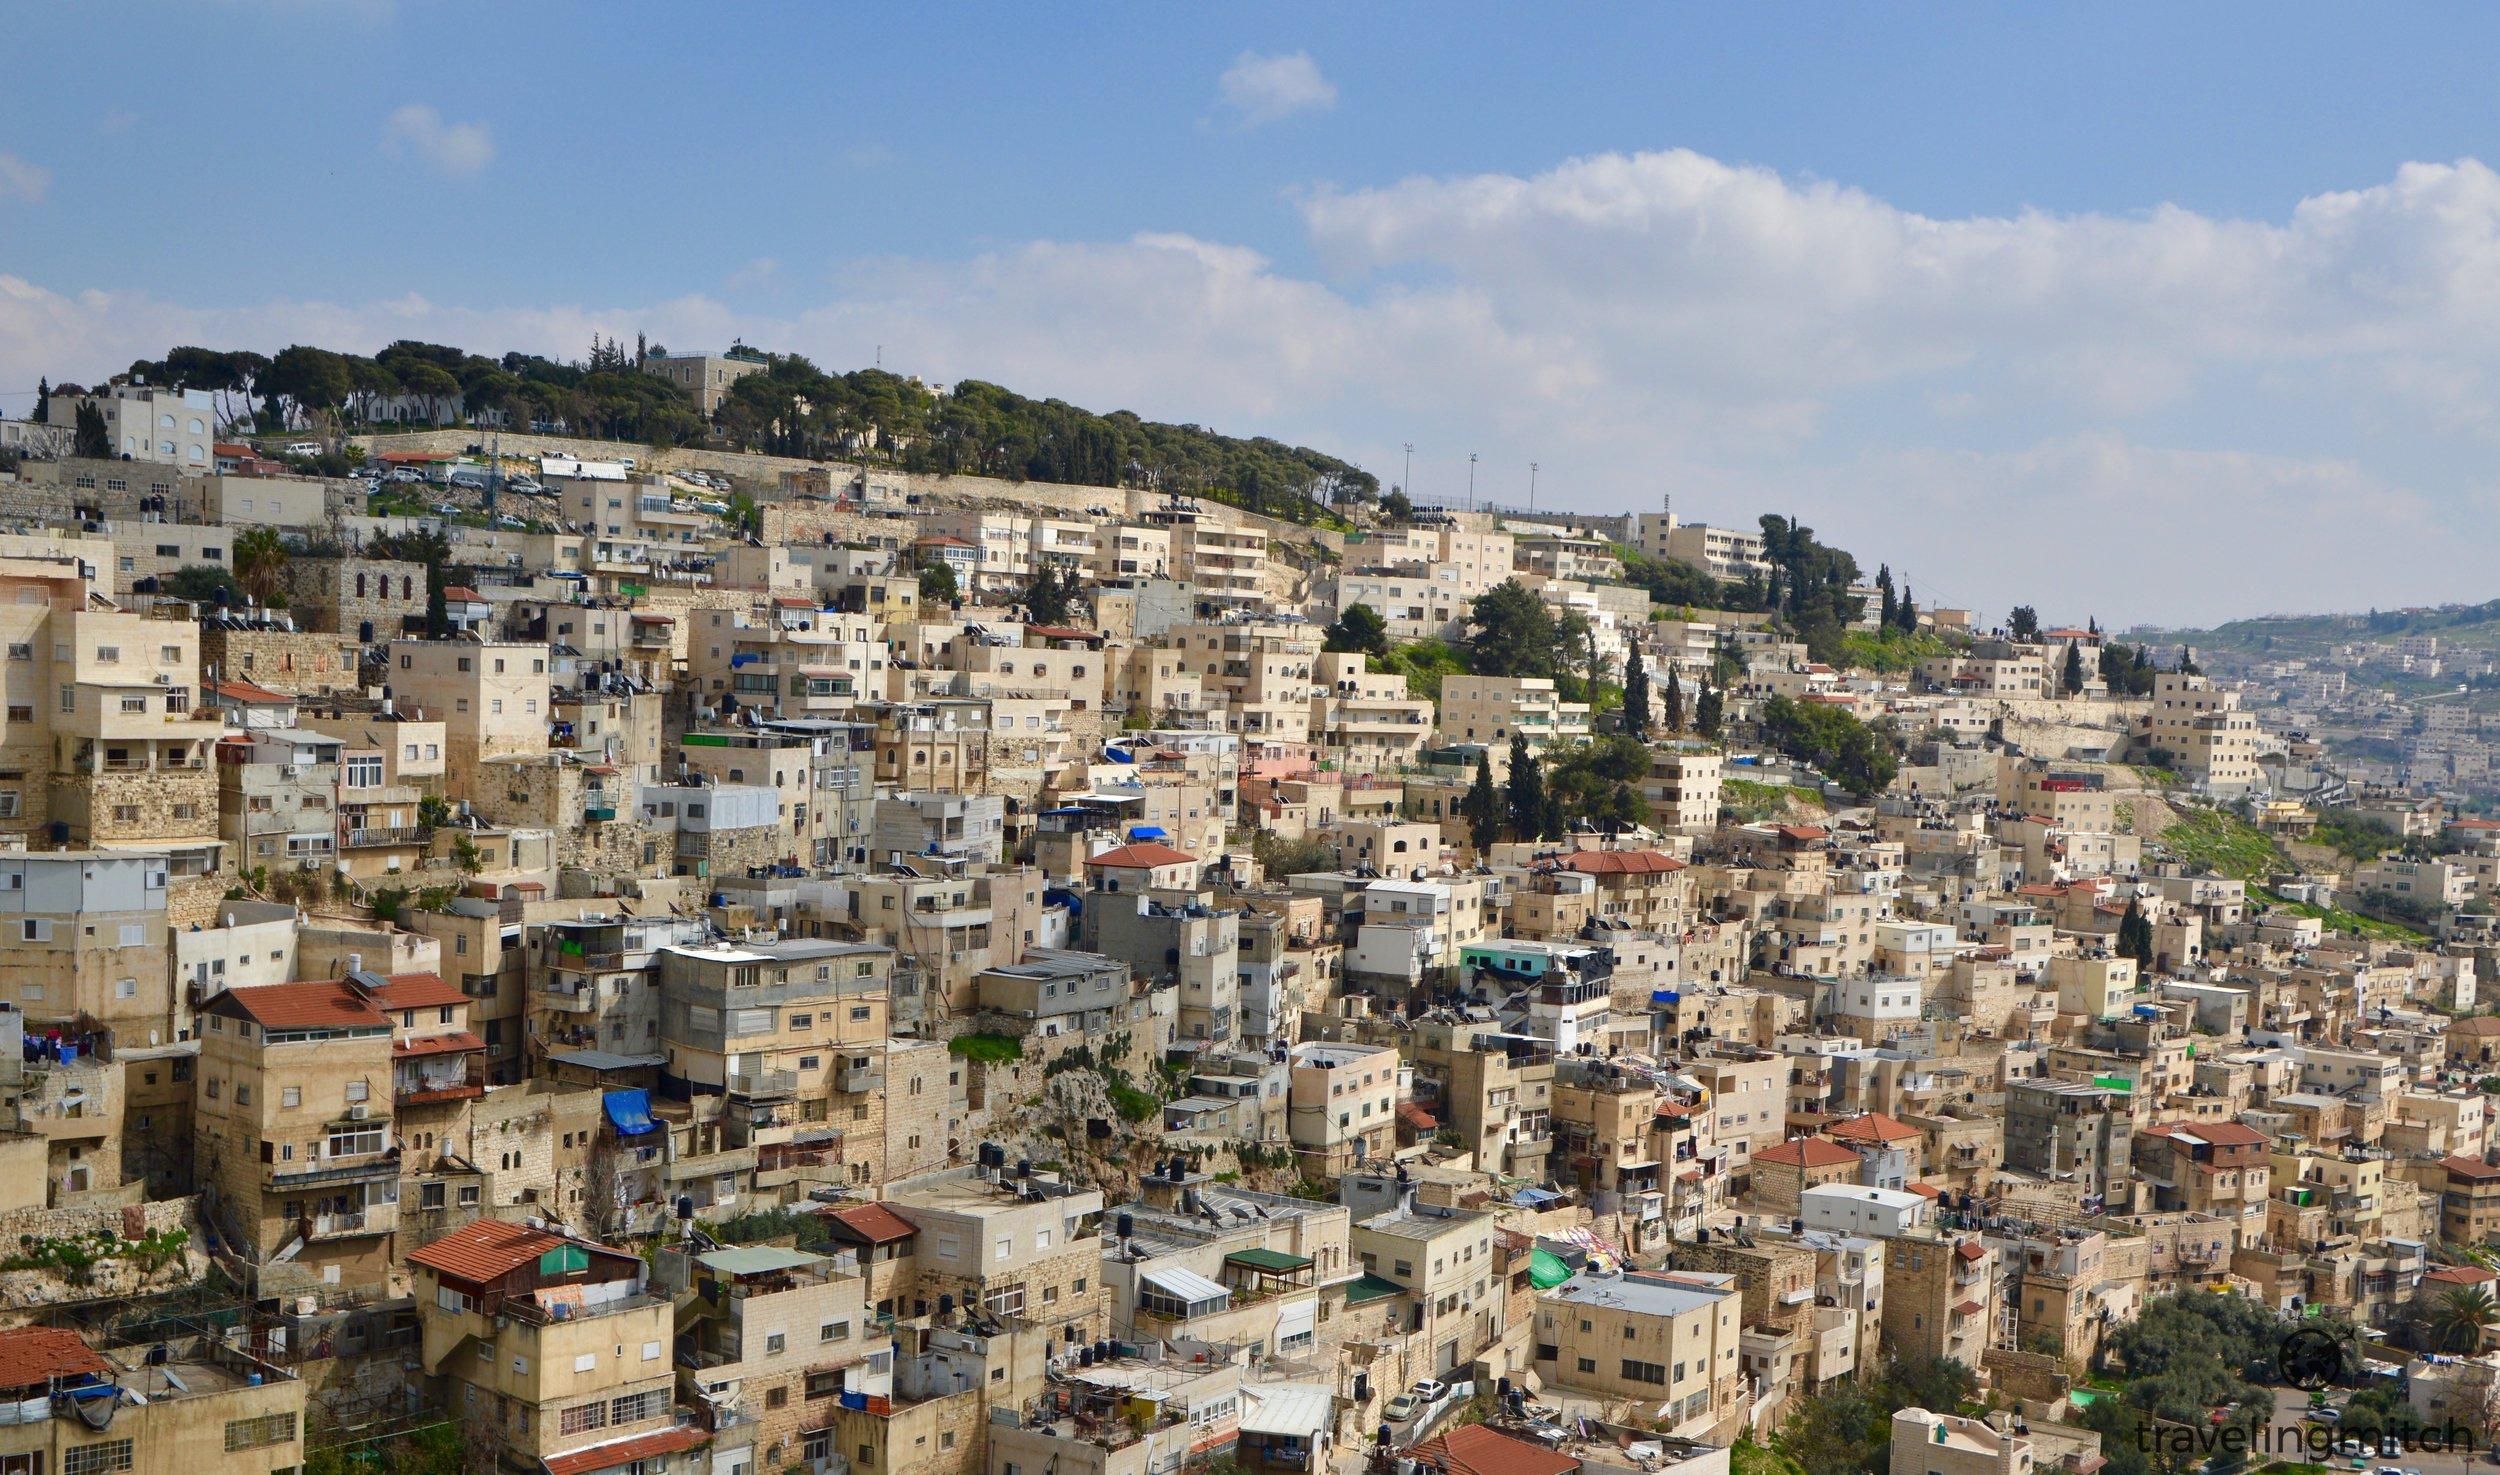 Views of East Jerusalem (Silwan) from the City of David - Jerusalem, Israel